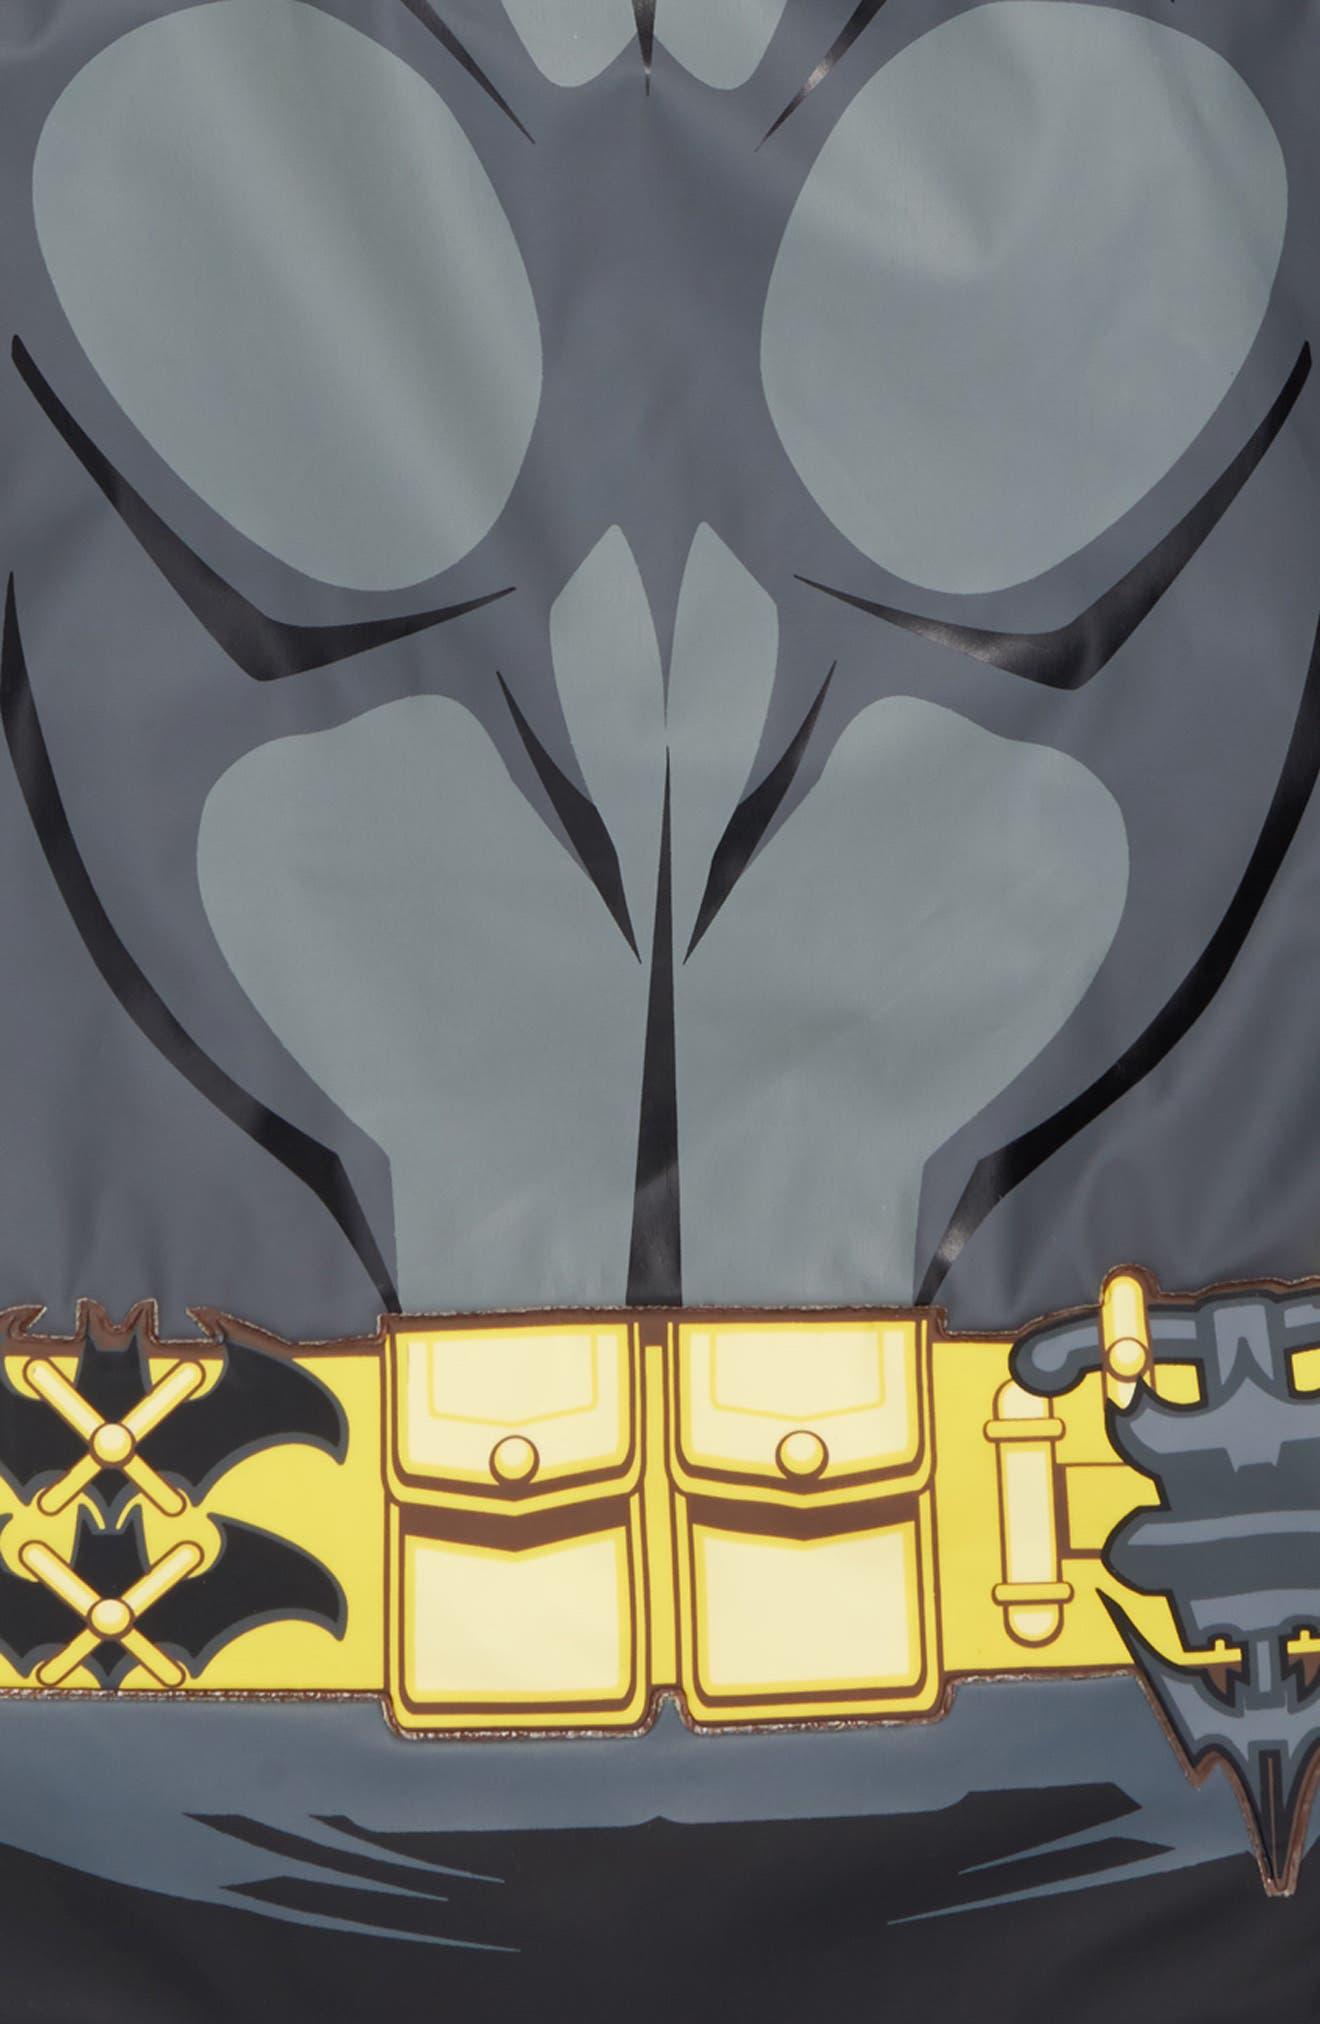 Batman Everlasting Hooded Raincoat,                             Alternate thumbnail 4, color,                             Black